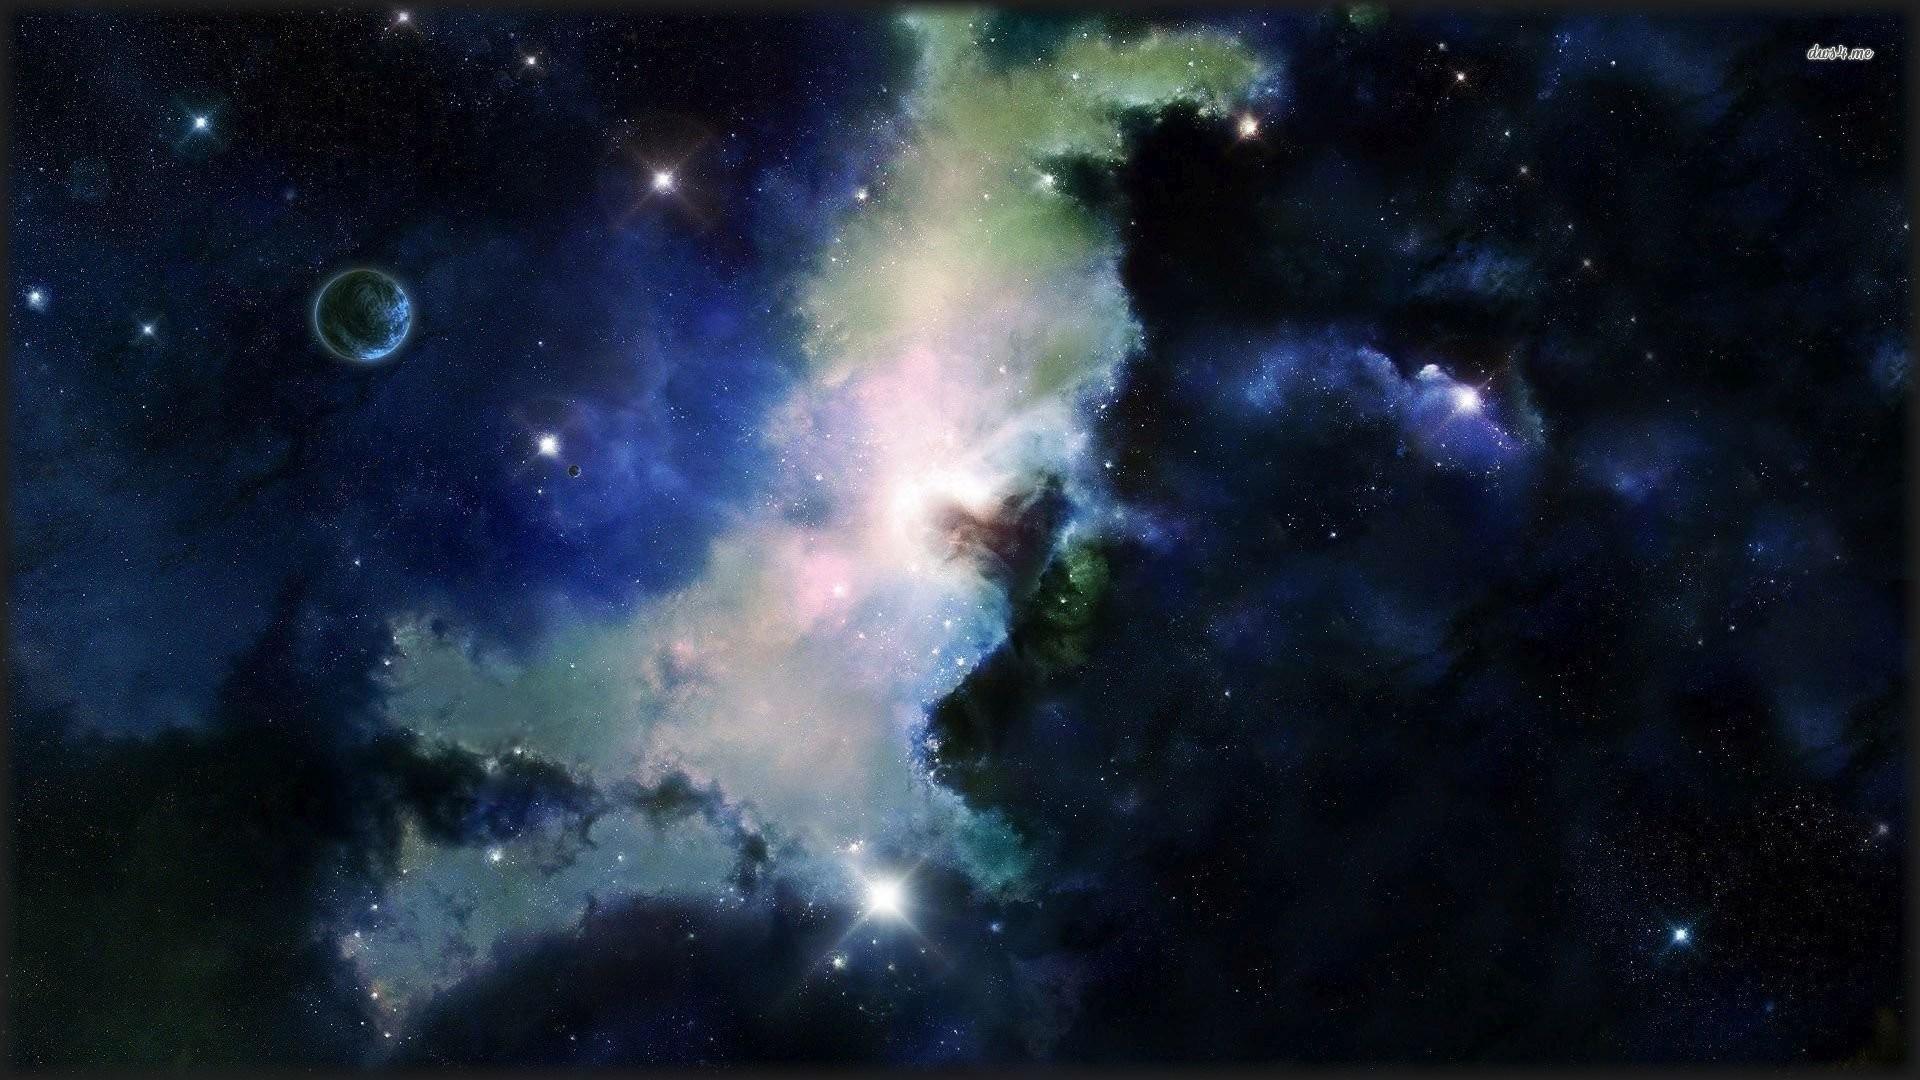 Blue Nebula Wallpaper | Free HD Desktop Backgrounds | The Final Frontier |  Pinterest | Nebula wallpaper, Hd desktop and Wallpaper